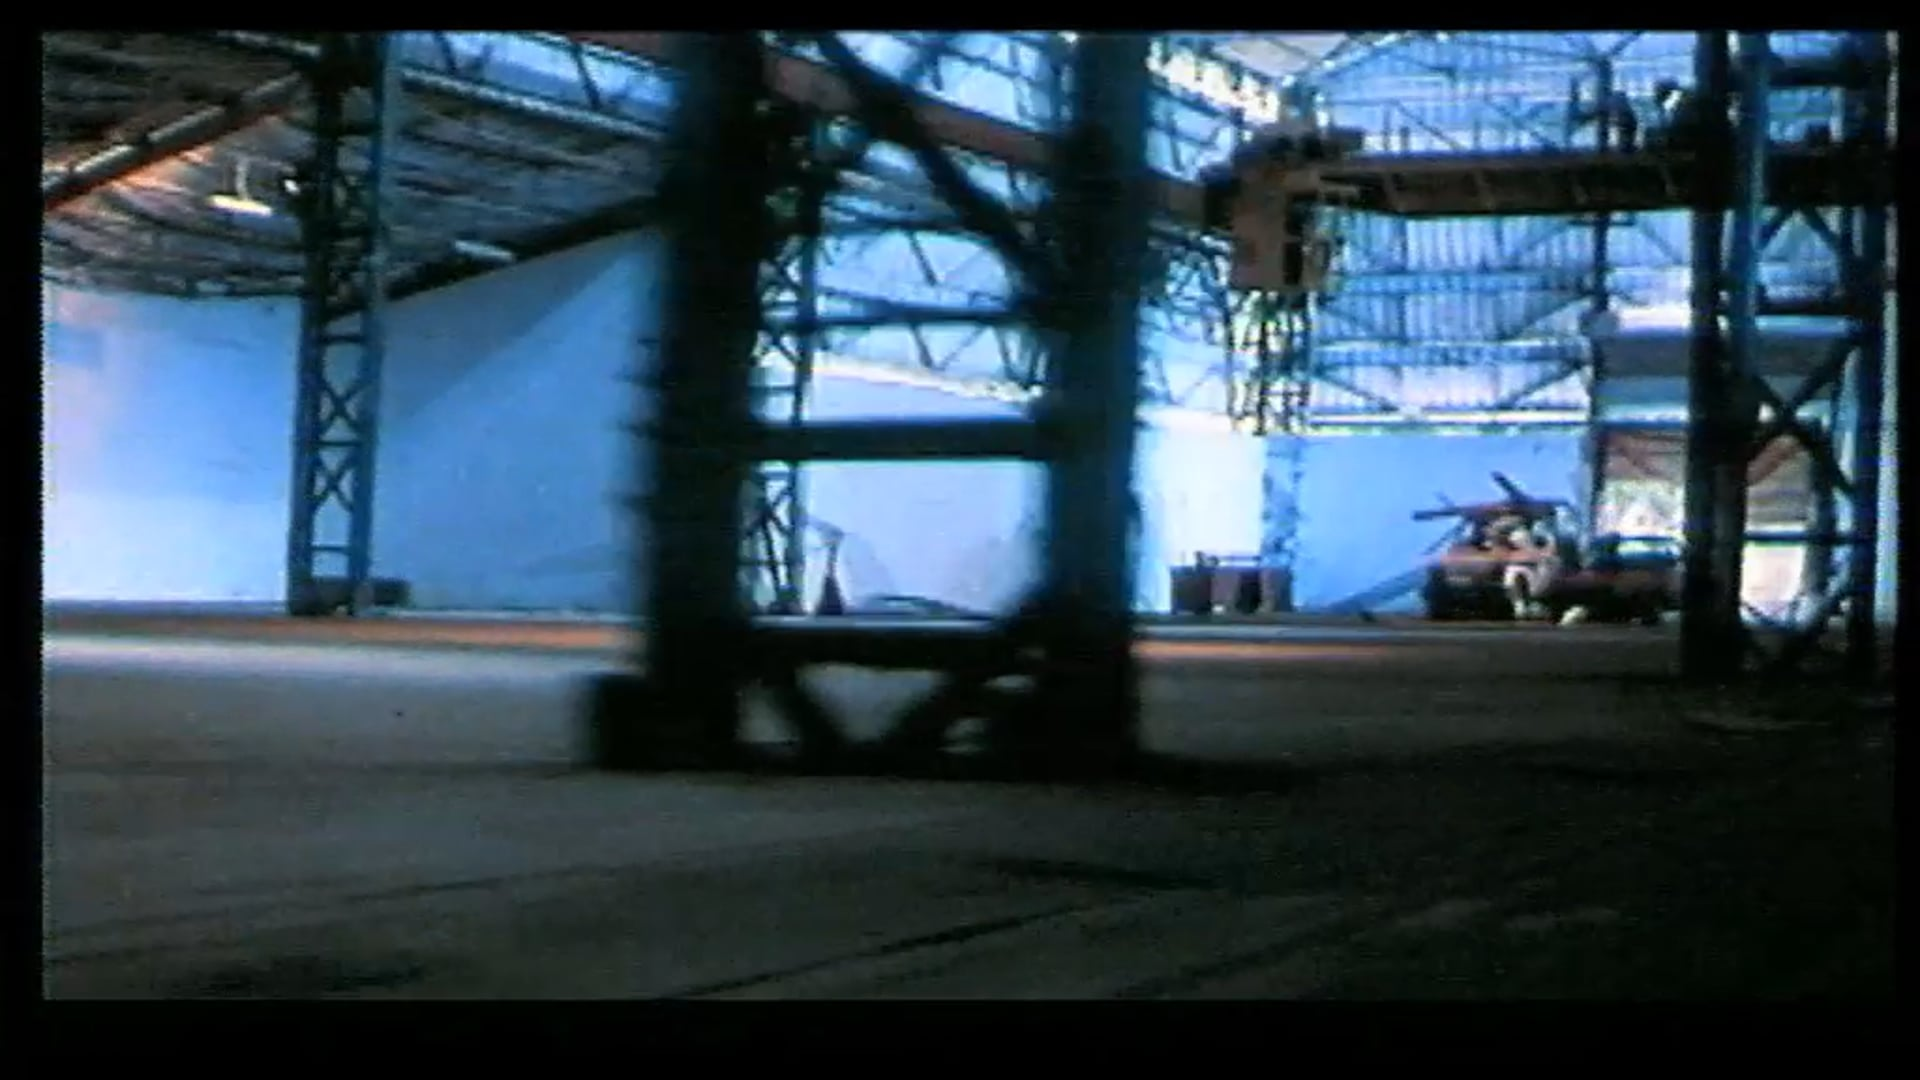 Emirates_Airlines - Movies